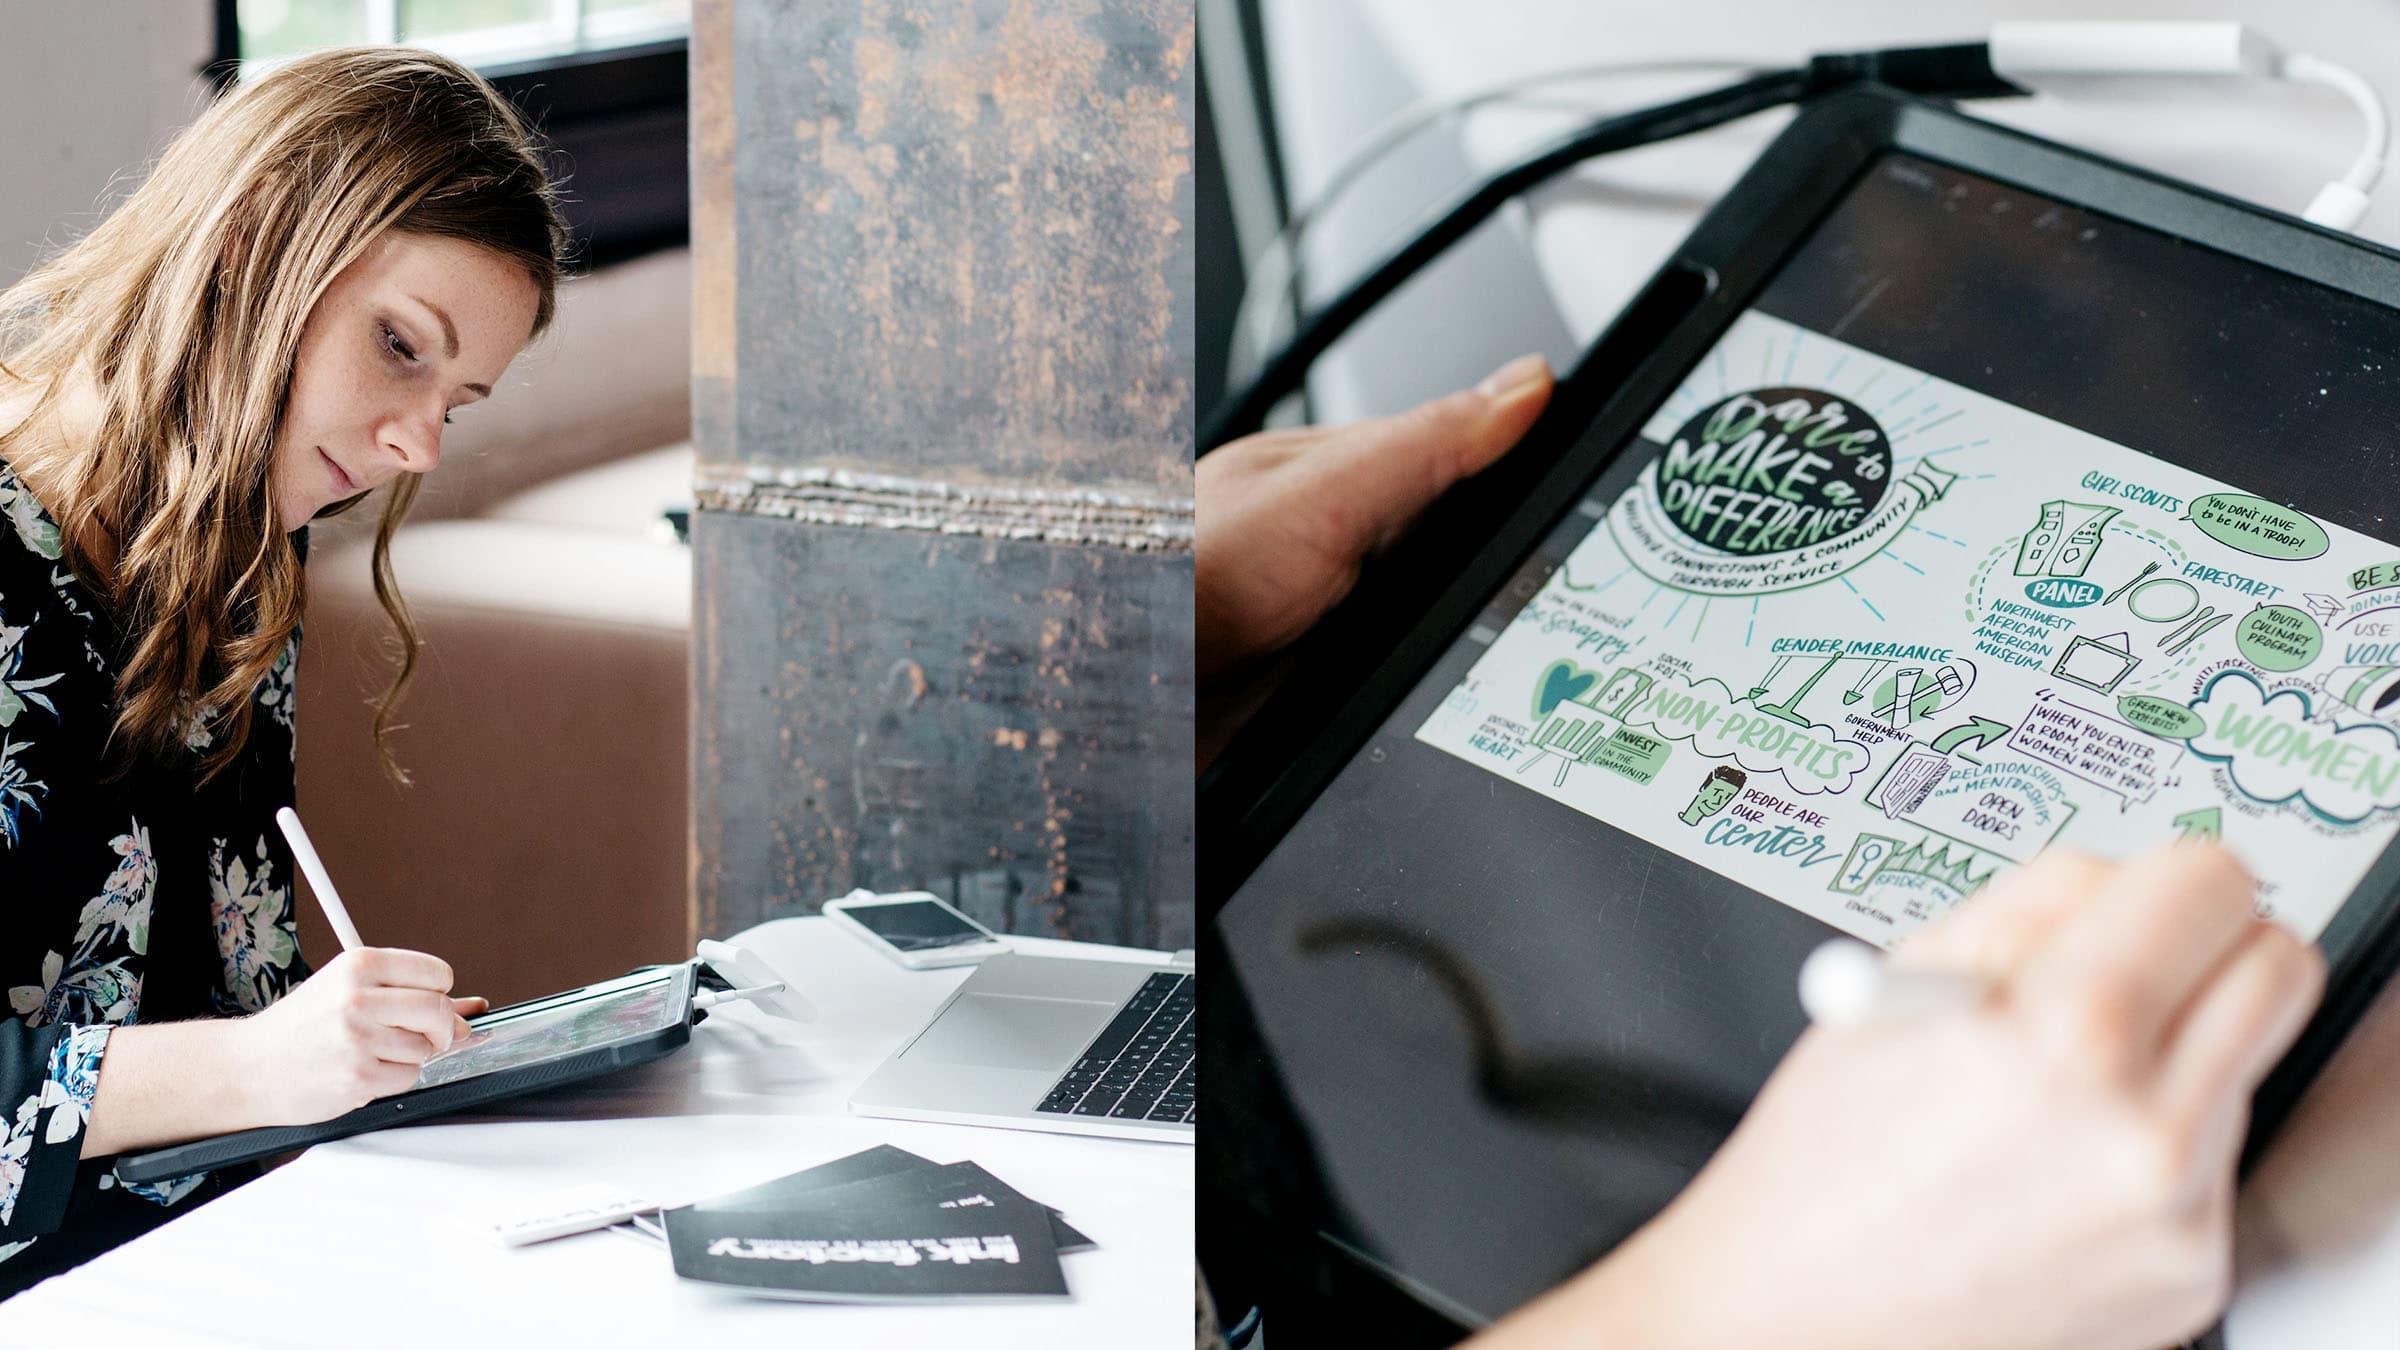 A digital visual notes artist capturing a keynote at a conference.